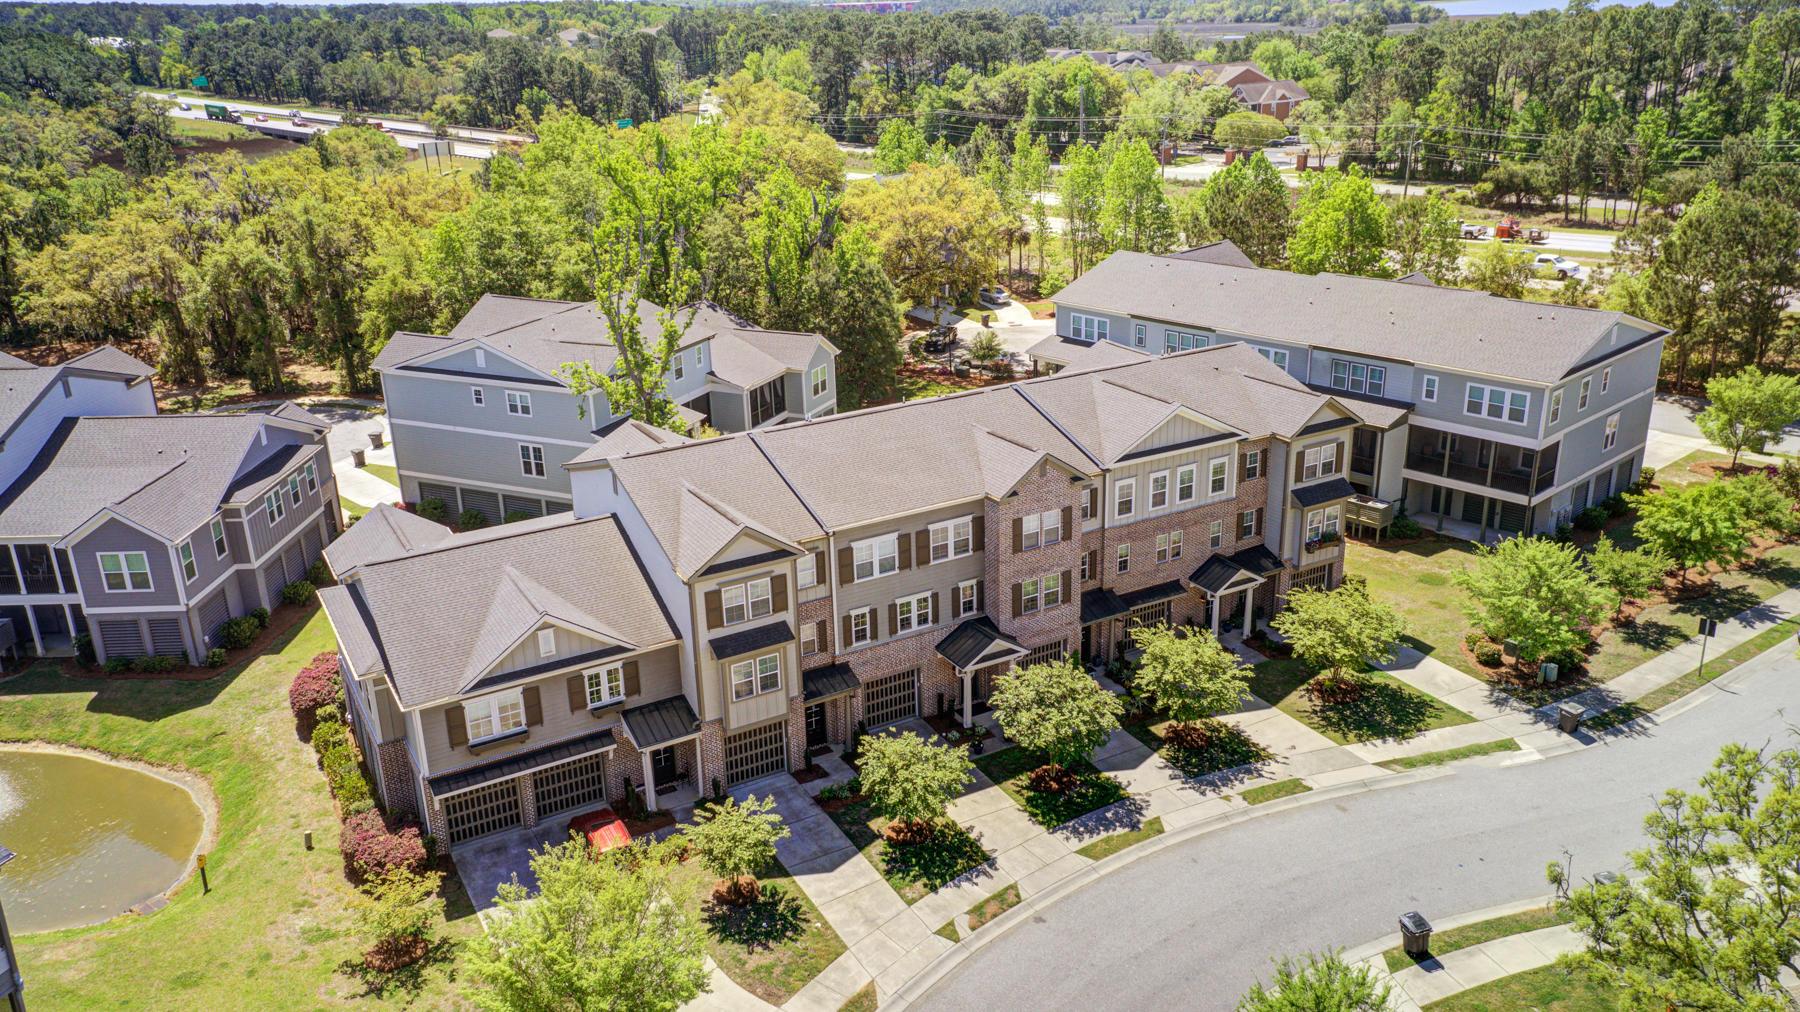 Etiwan Pointe Homes For Sale - 254 Slipper Shell, Mount Pleasant, SC - 27